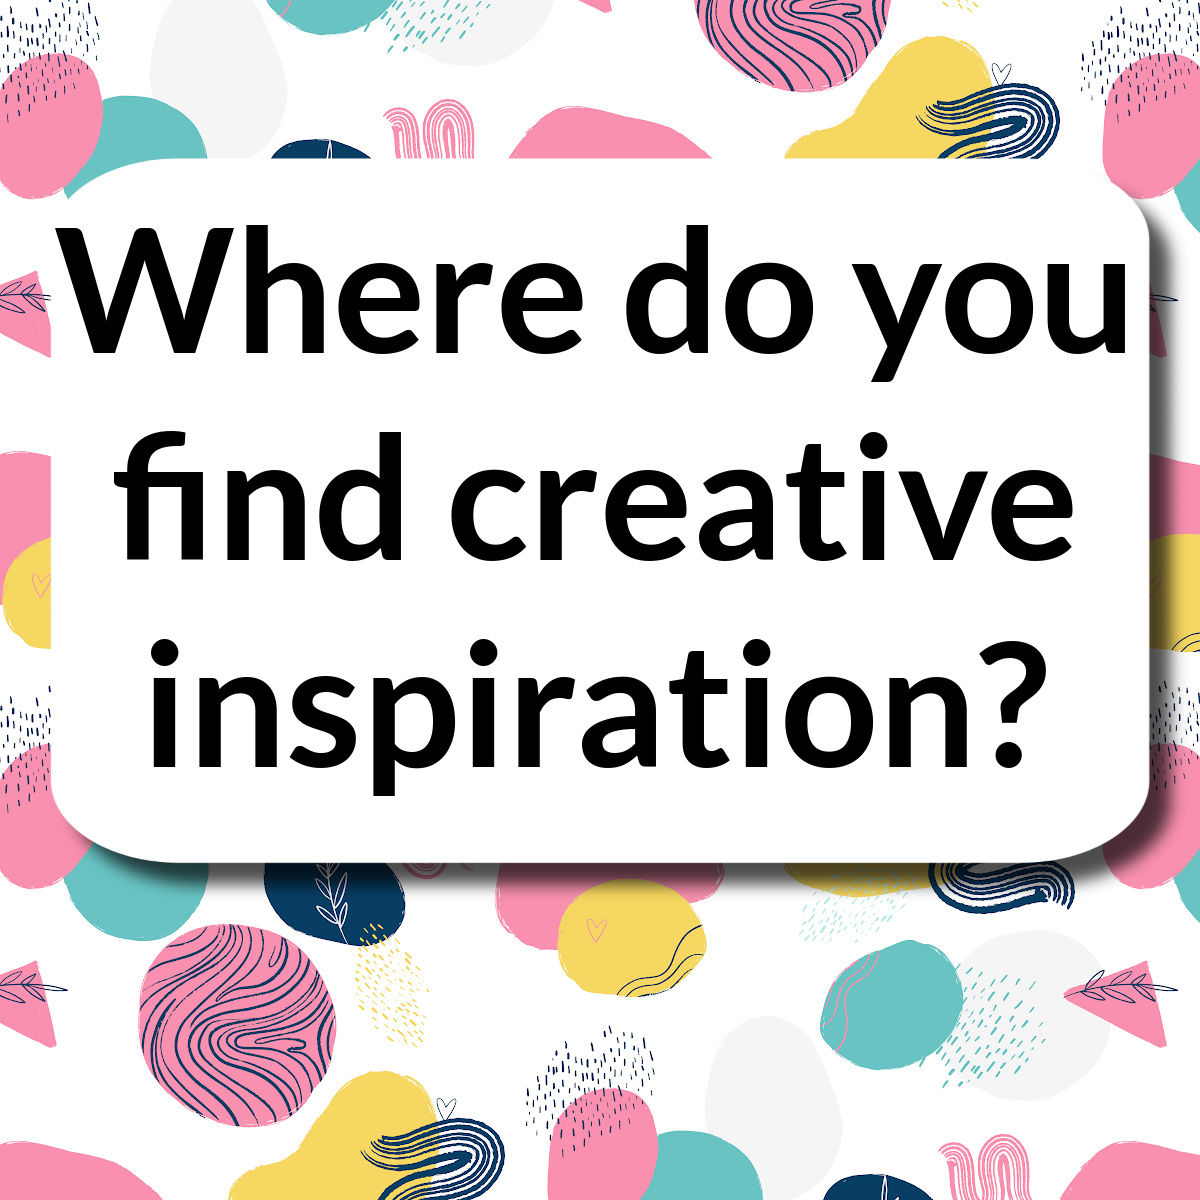 Where do you find creative inspiration?